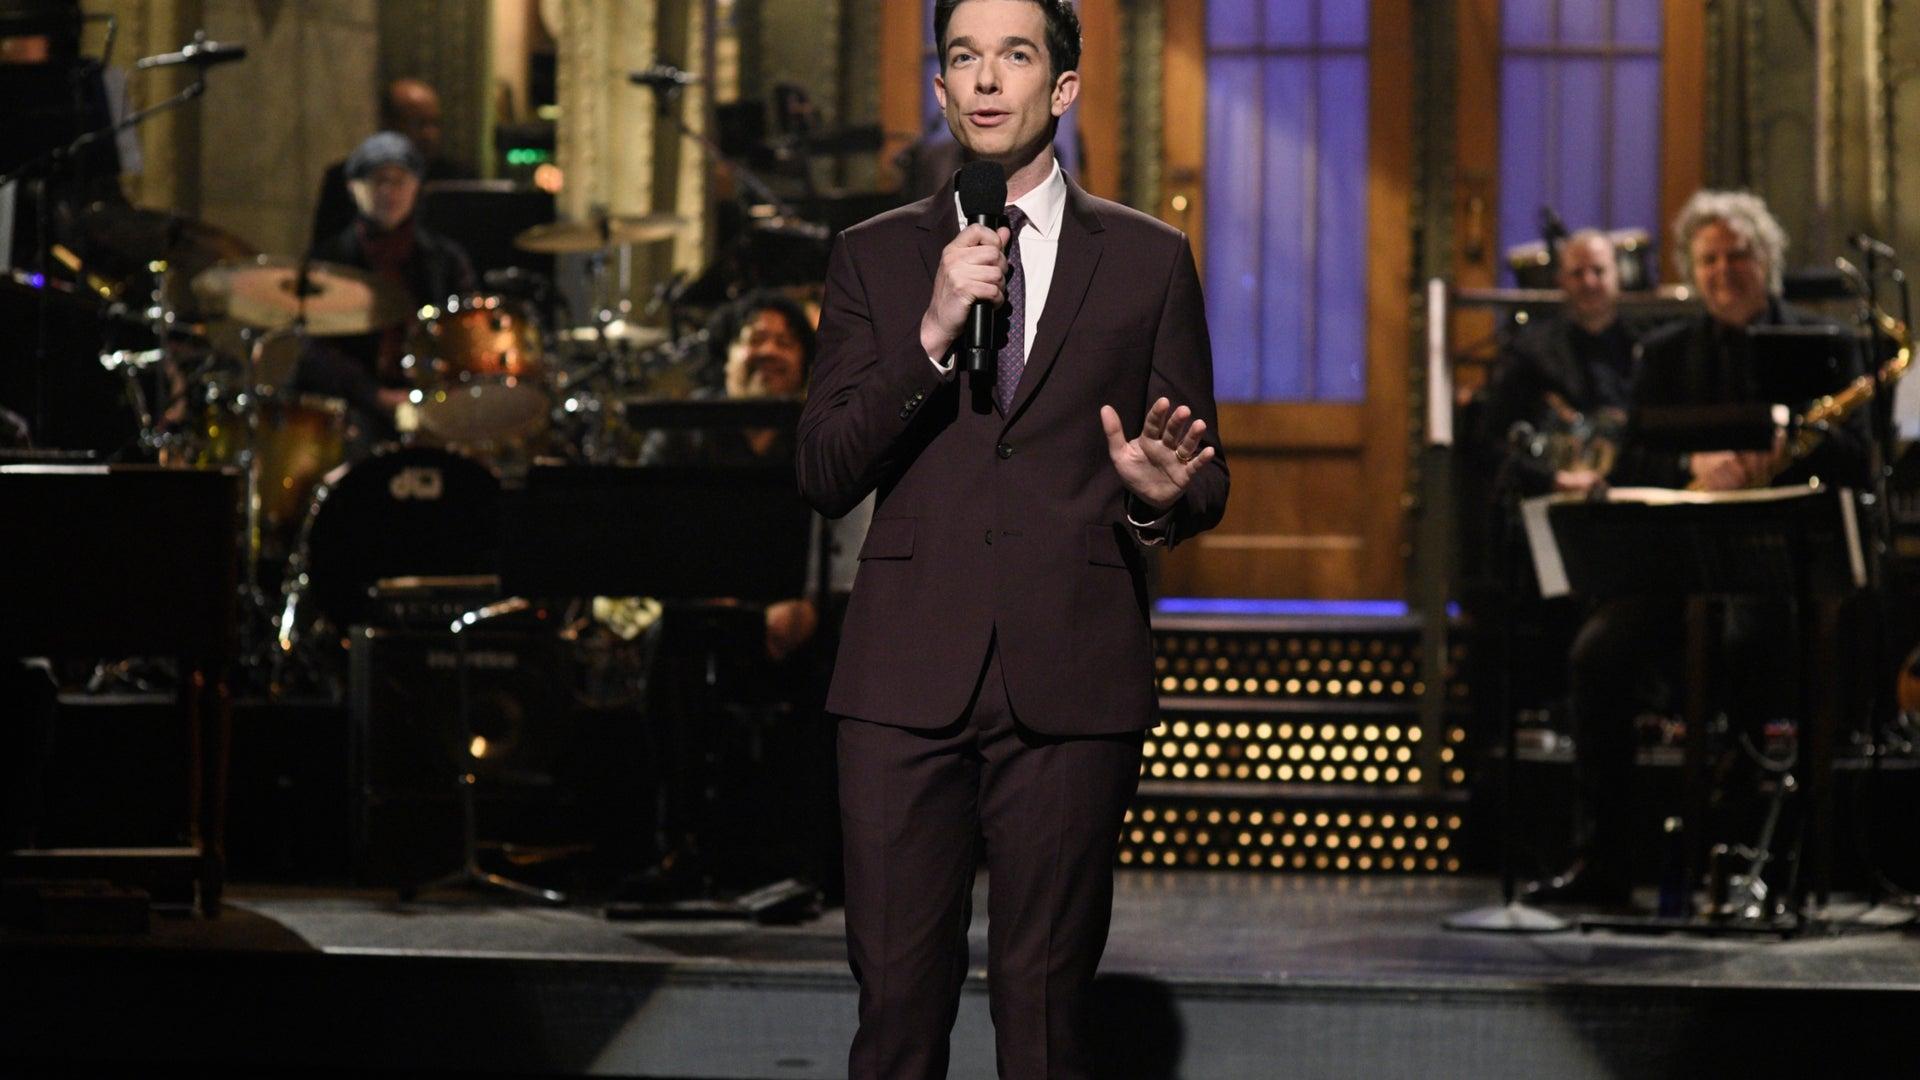 John Mulaney, Saturday Night Live